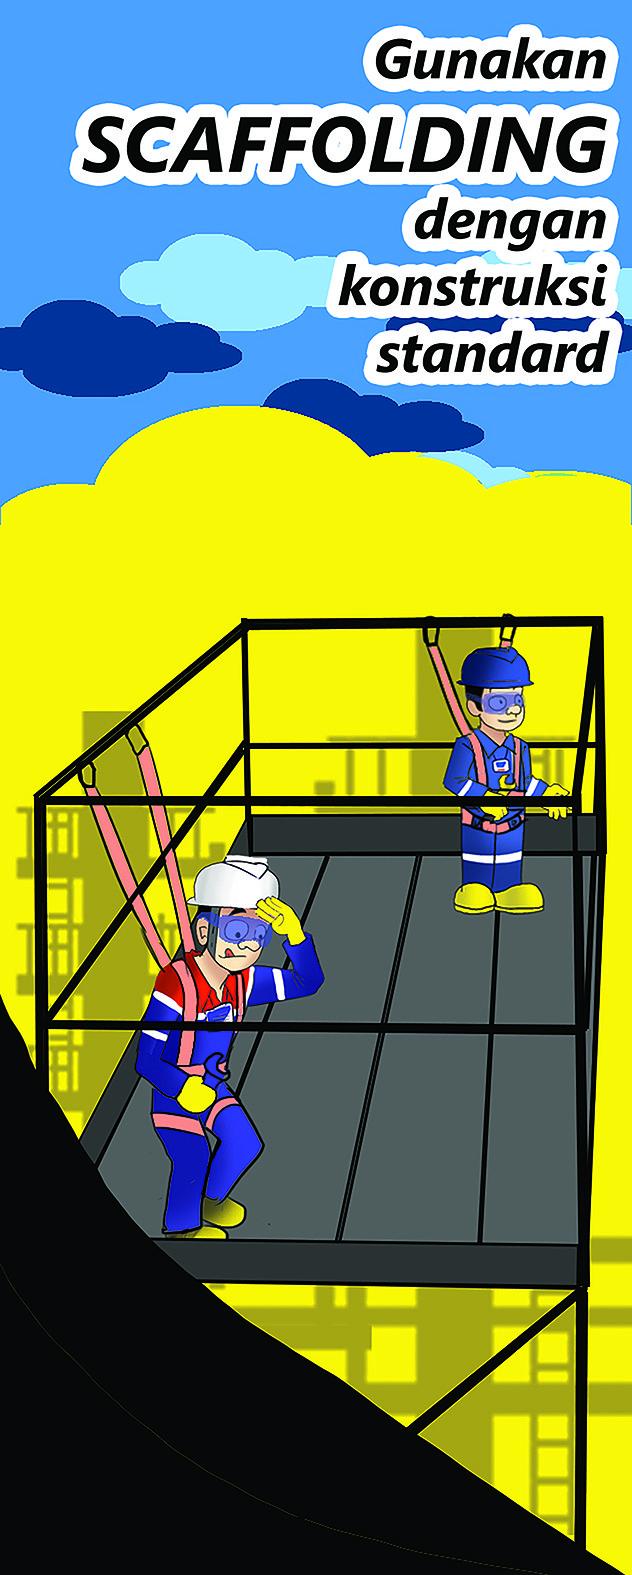 Putra wira adhiprajna 14 scaffolding